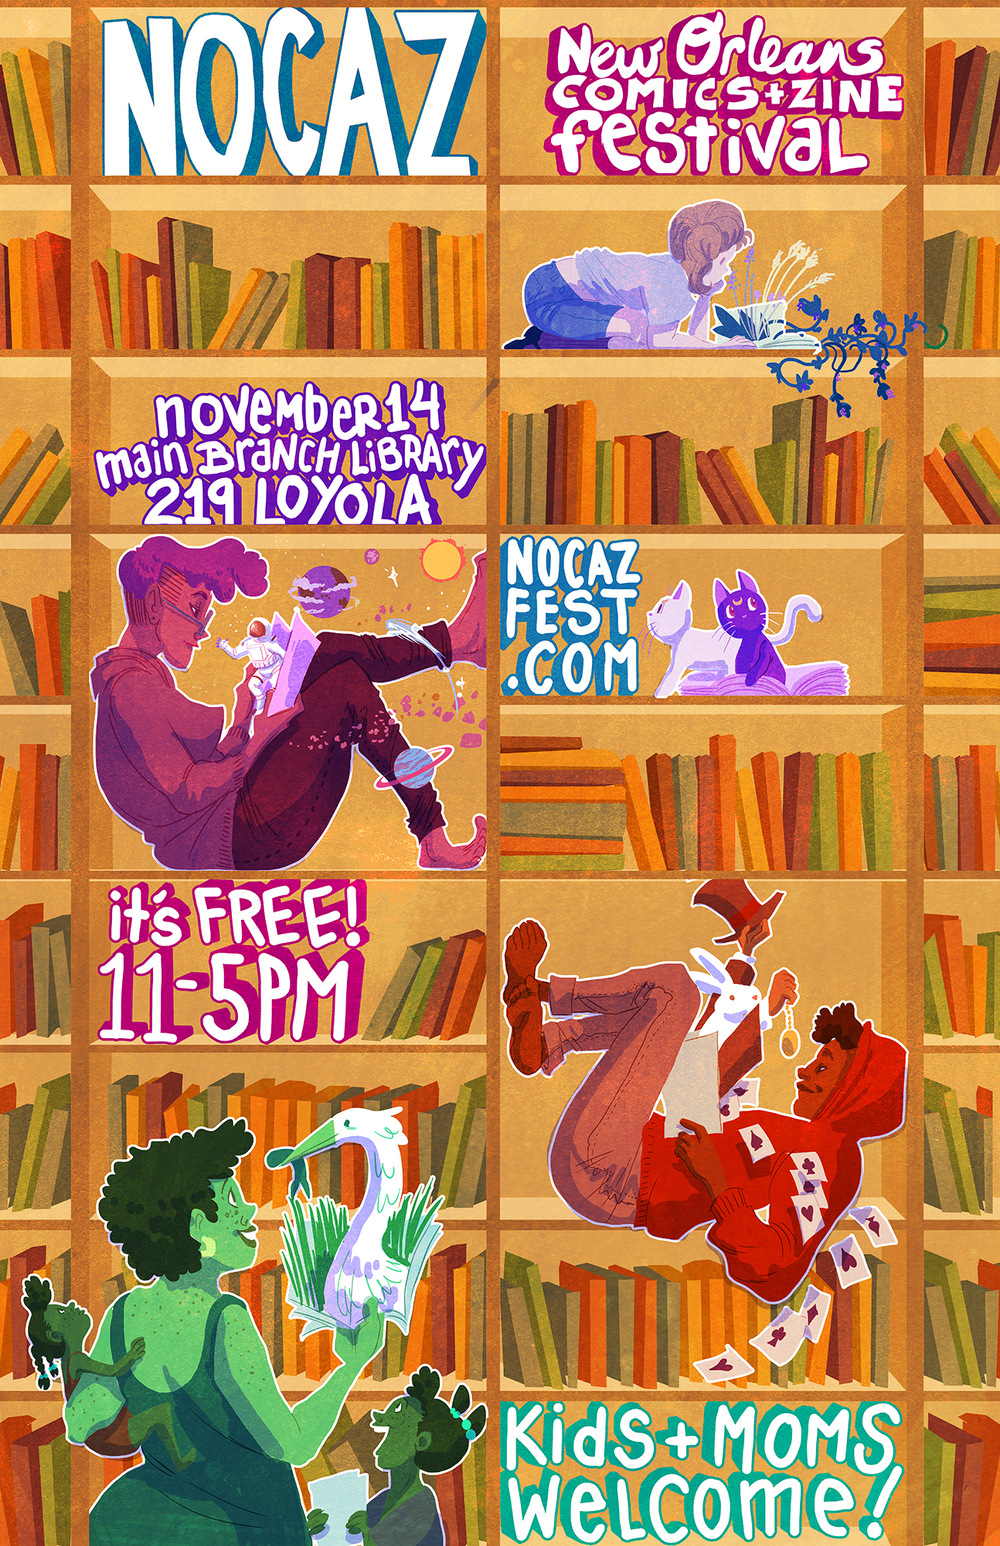 New Orleans Comics and Zine Festival (NOCAZ)